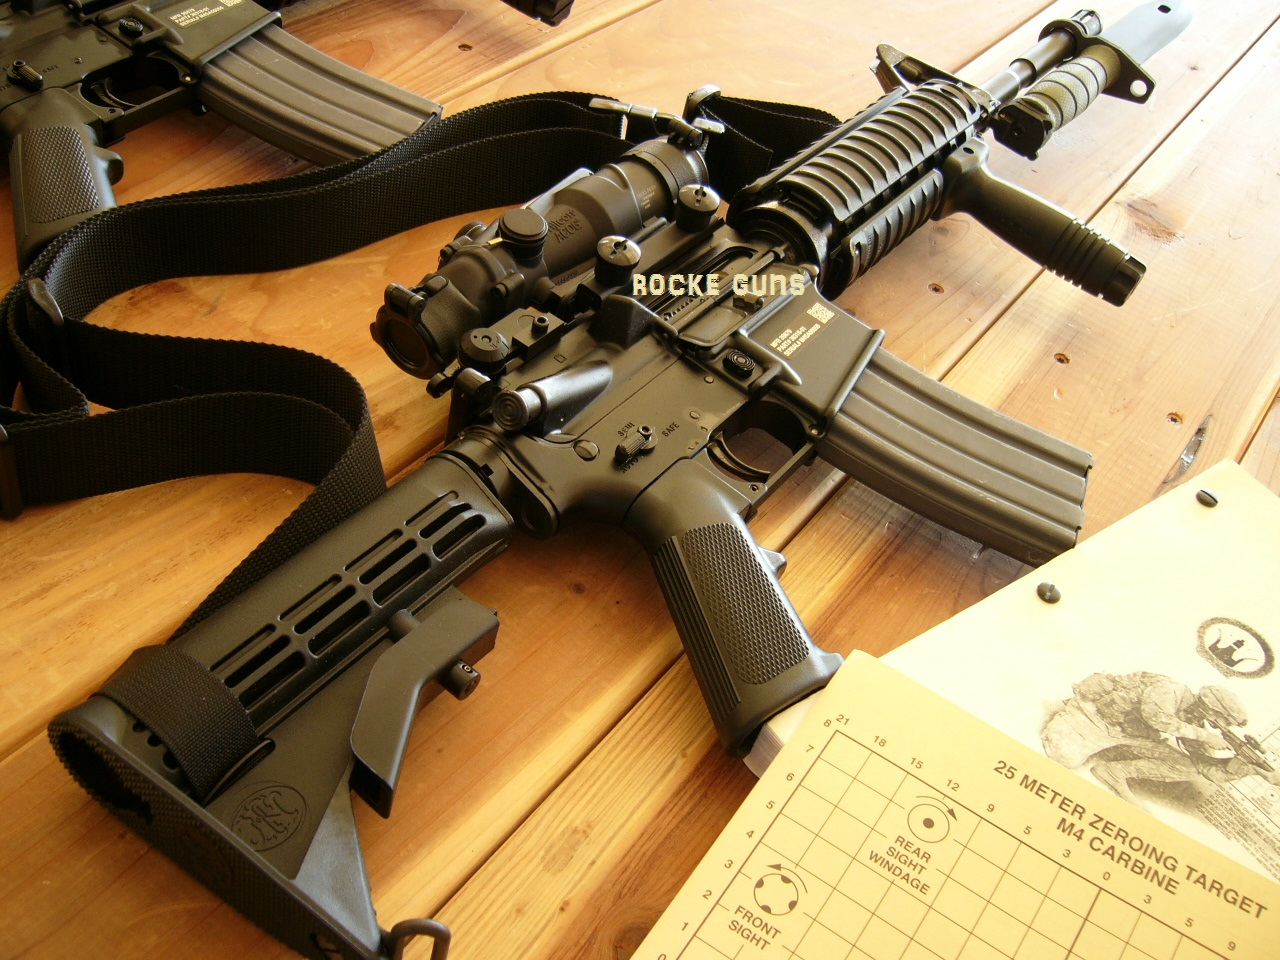 Us Army Issue M4 Deployment Pkg Civvie Legal Rocke Guns